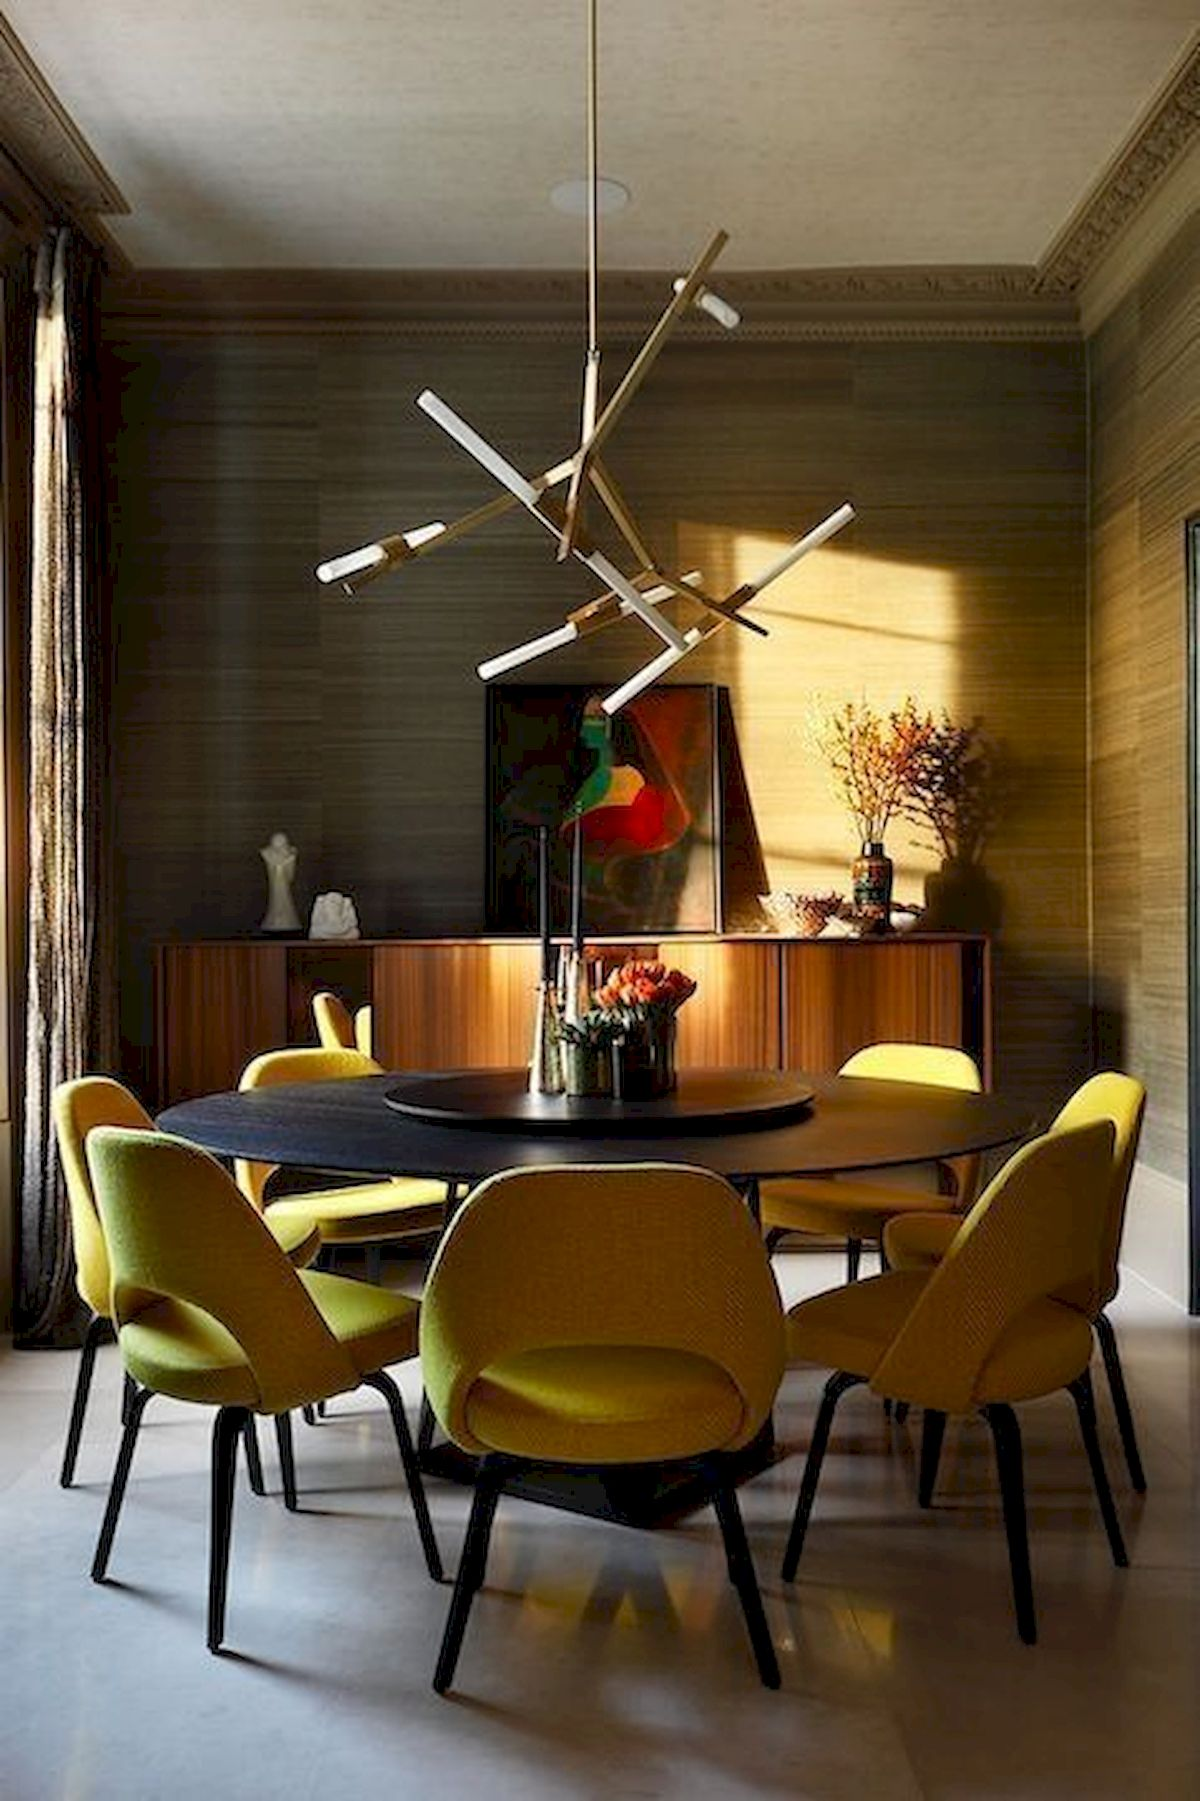 80 Elegant Modern Dining Room Design And Decor Ideas (63)